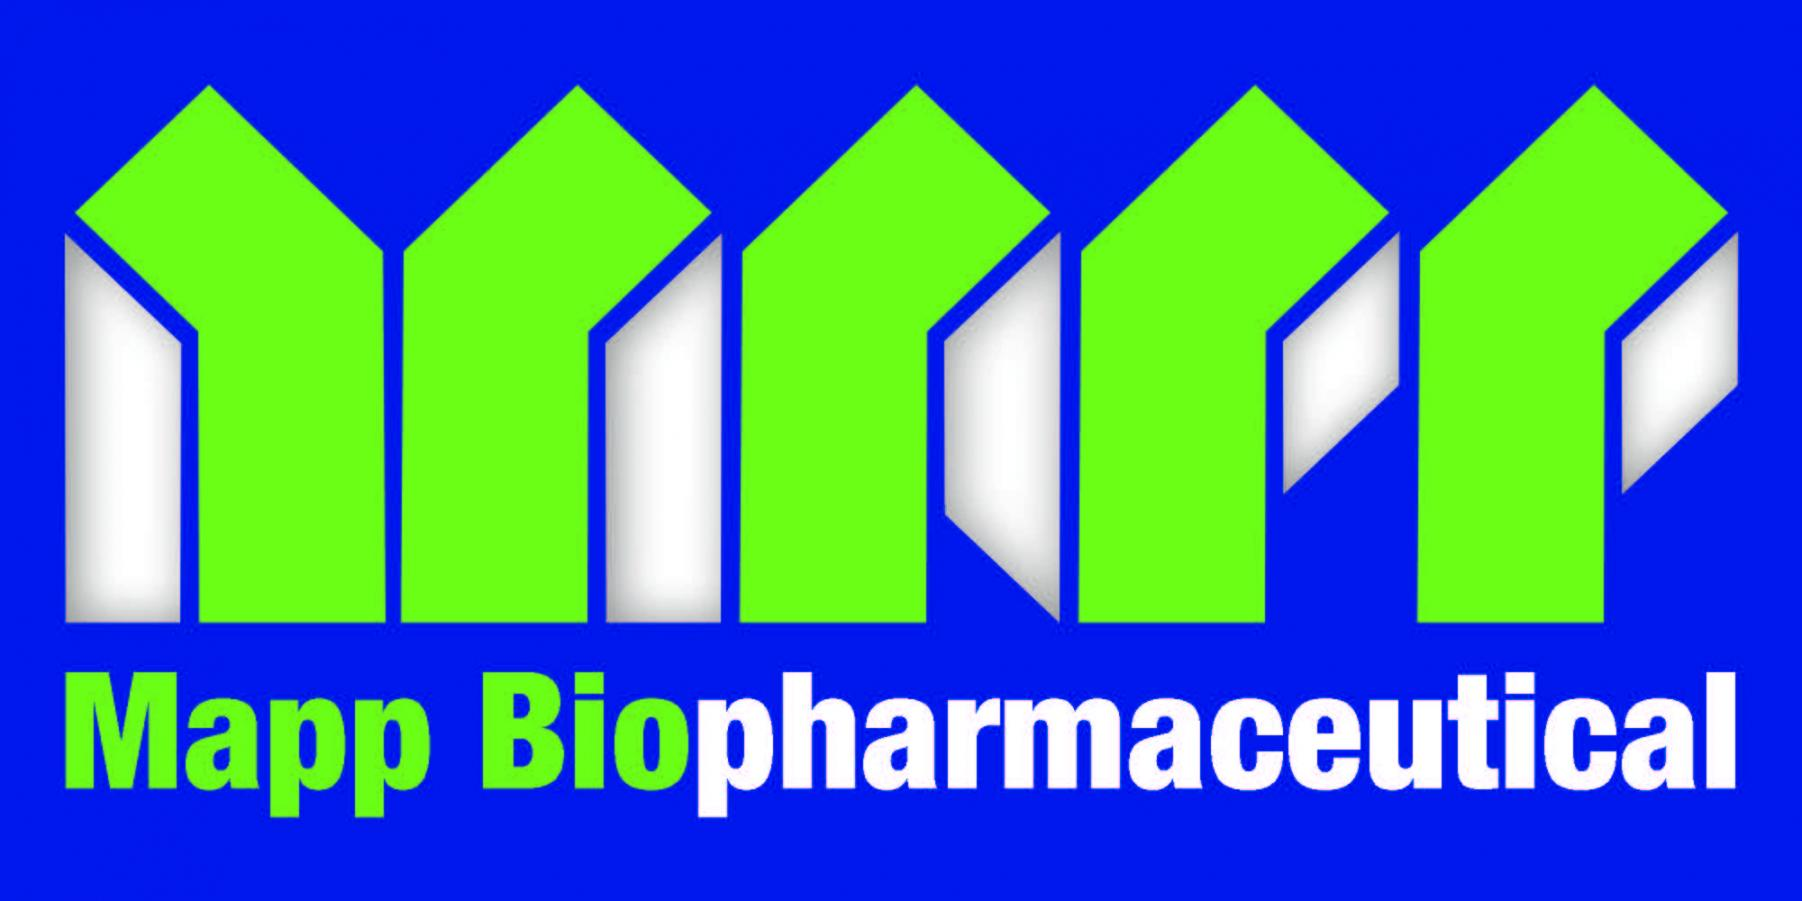 Mapp Biopharmaceutical, Inc. Logo